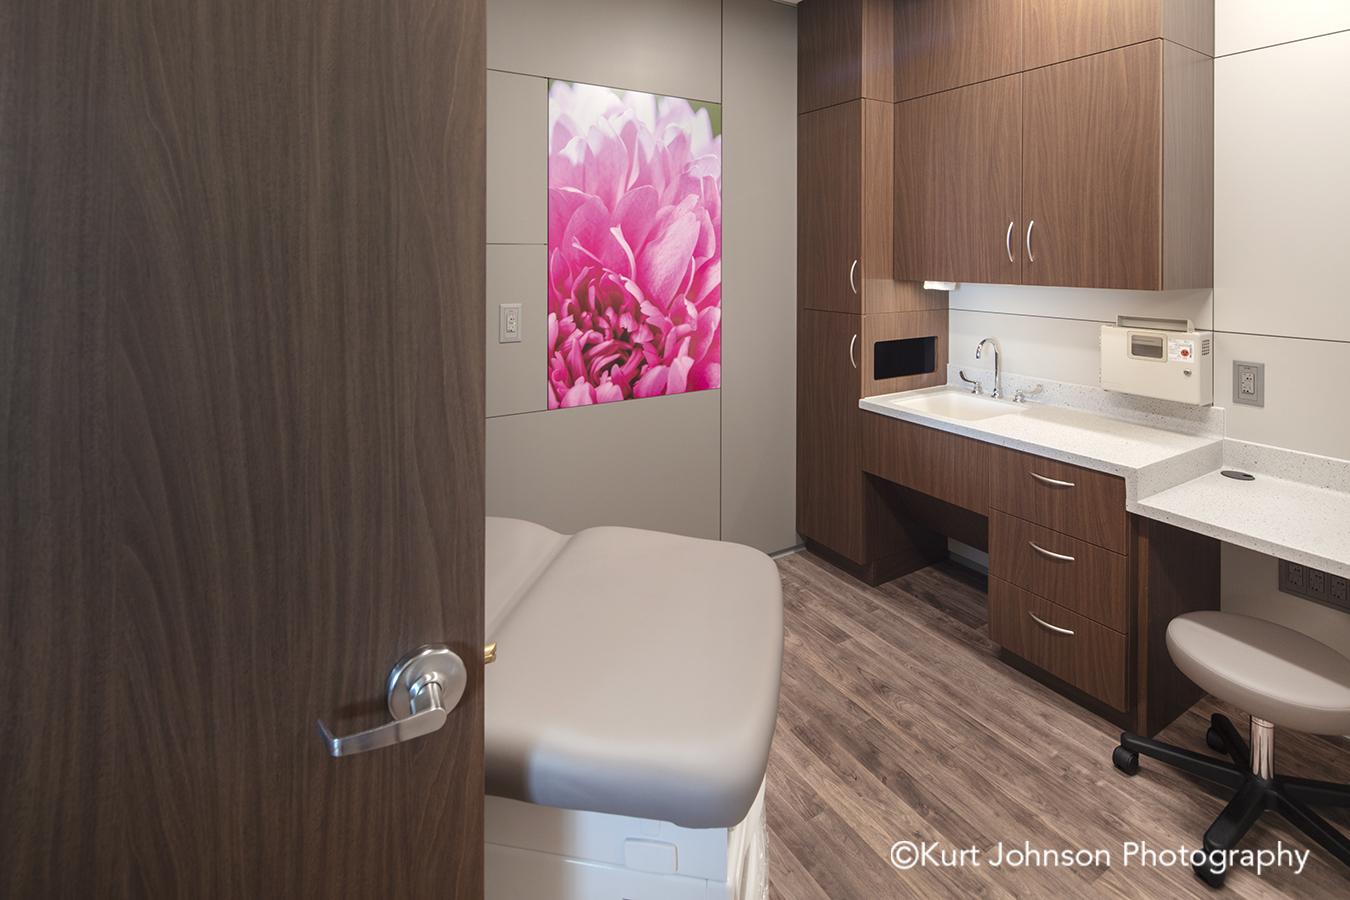 pink flower methodist physicians clinic elkhorn nebraska best care patient room DIRTT environmental solutions wall art install installation AOI